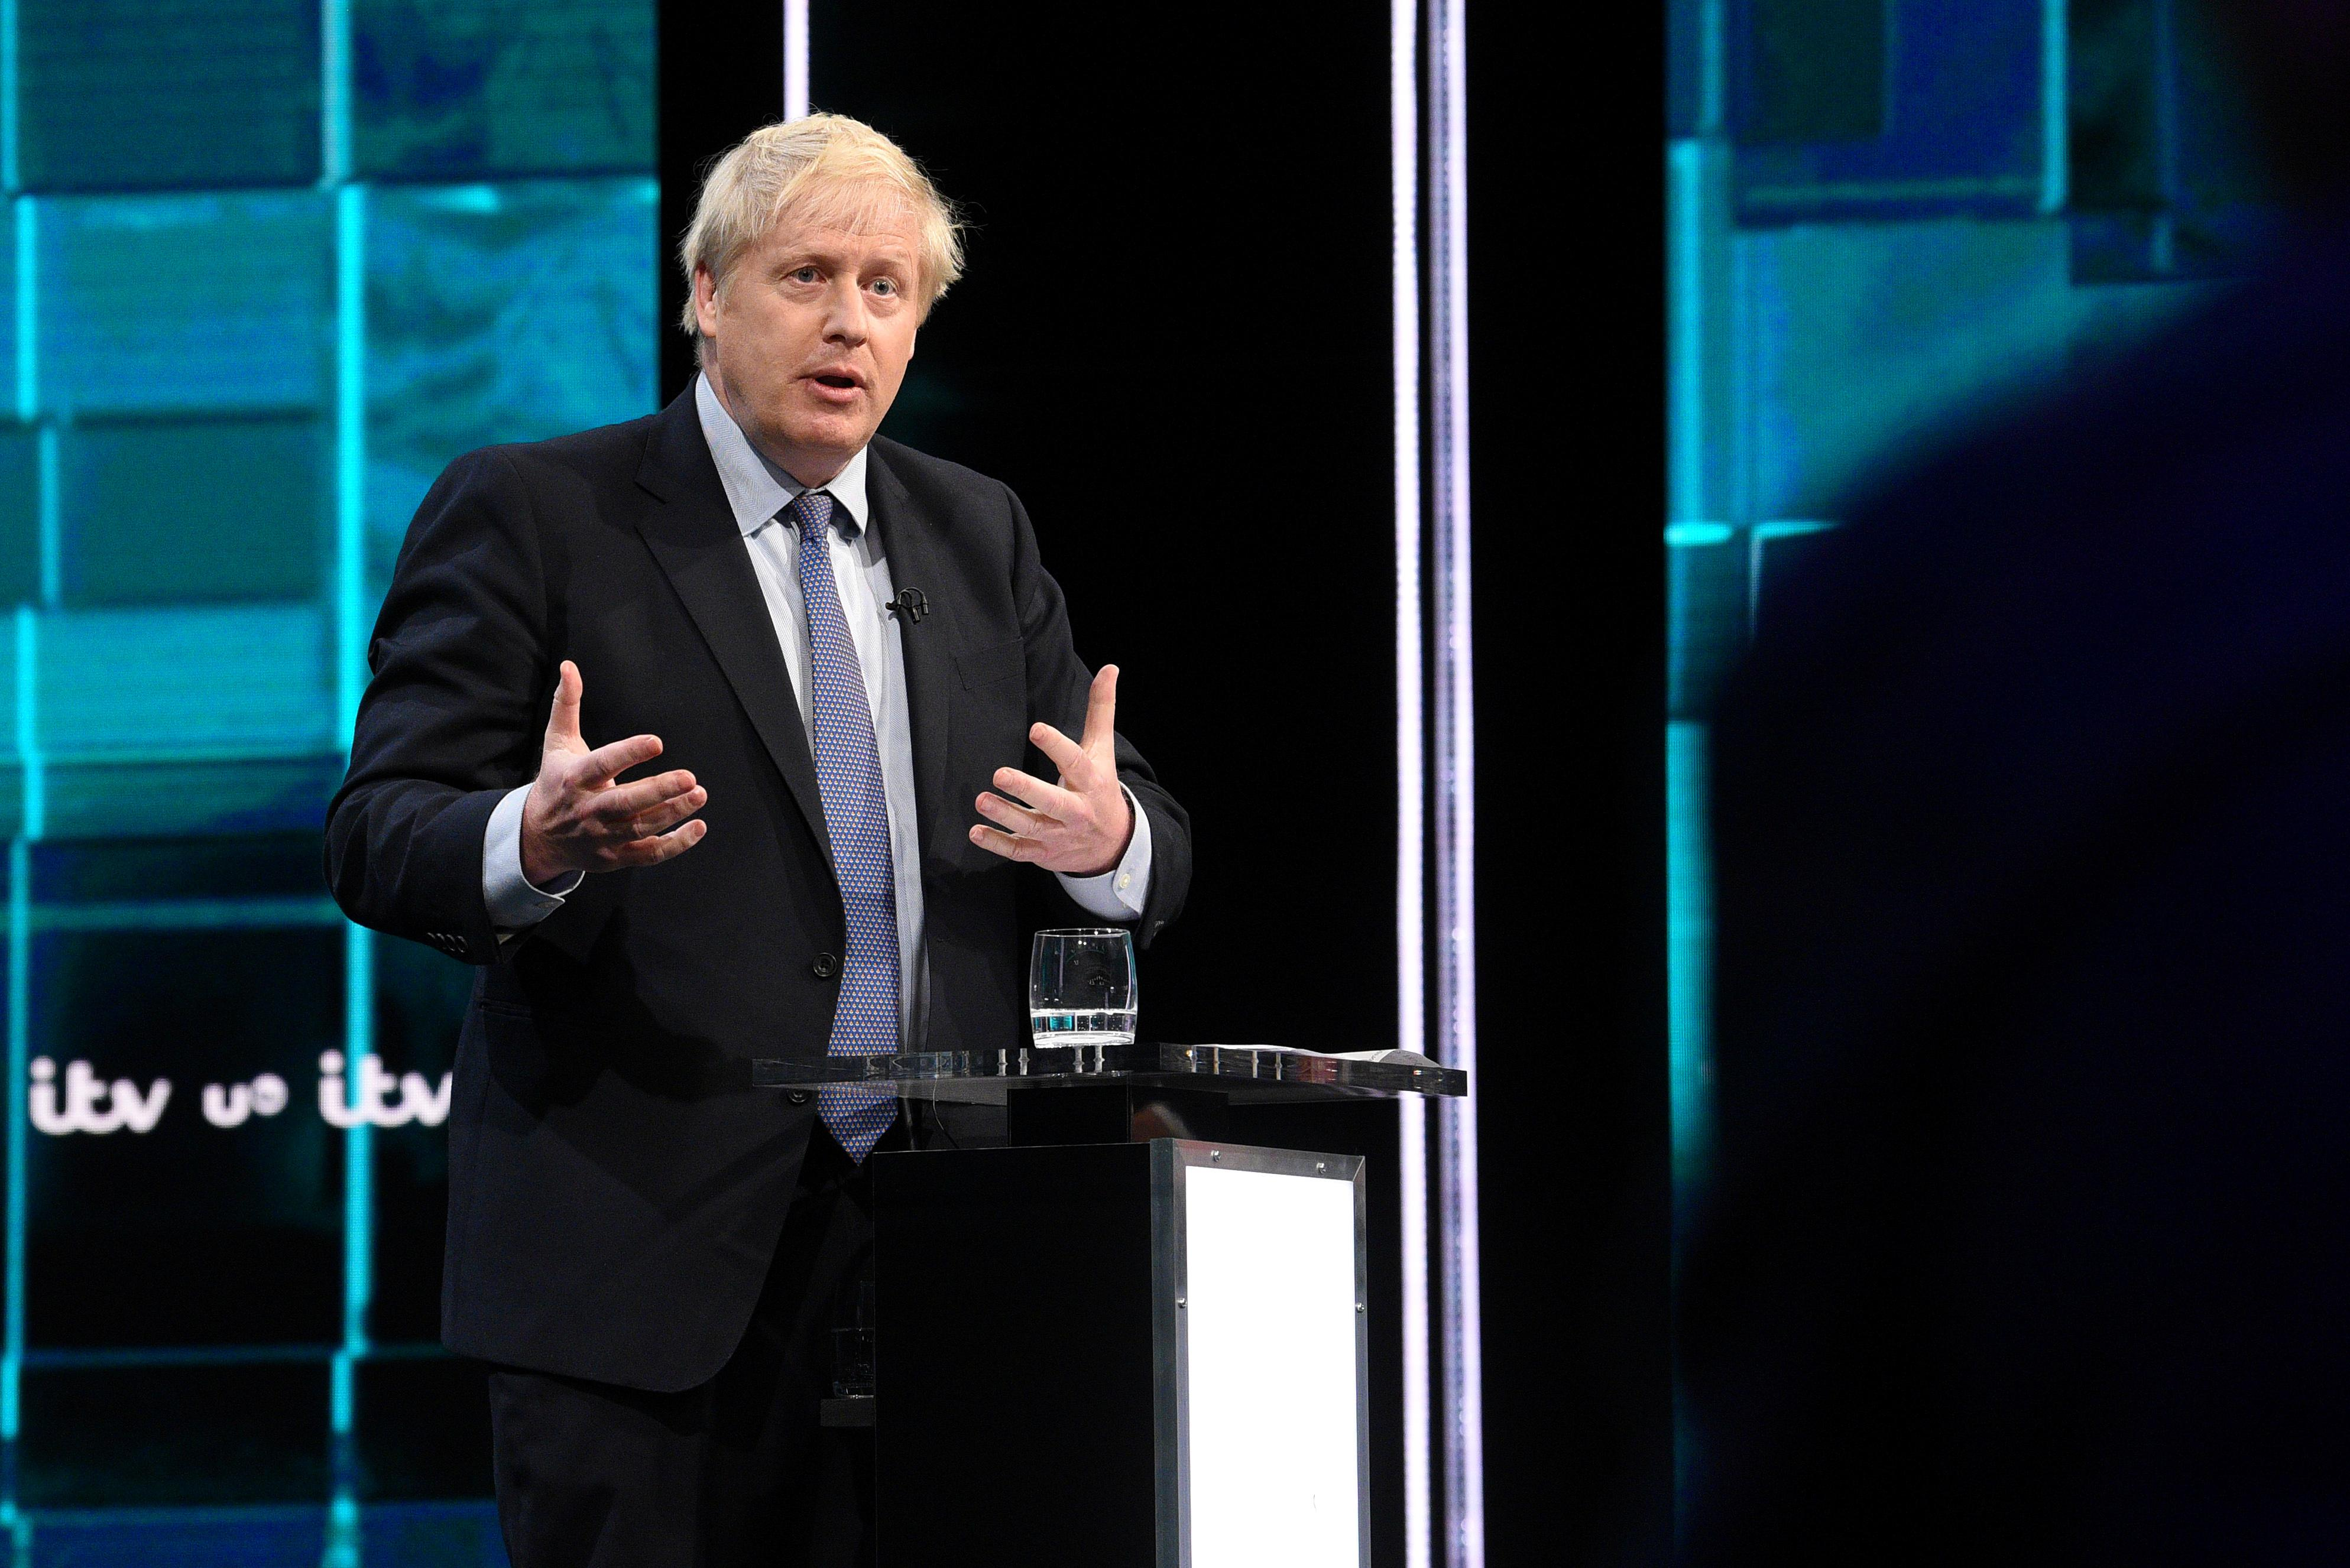 Johnson raises prospect of 10 billion pound payroll tax cut